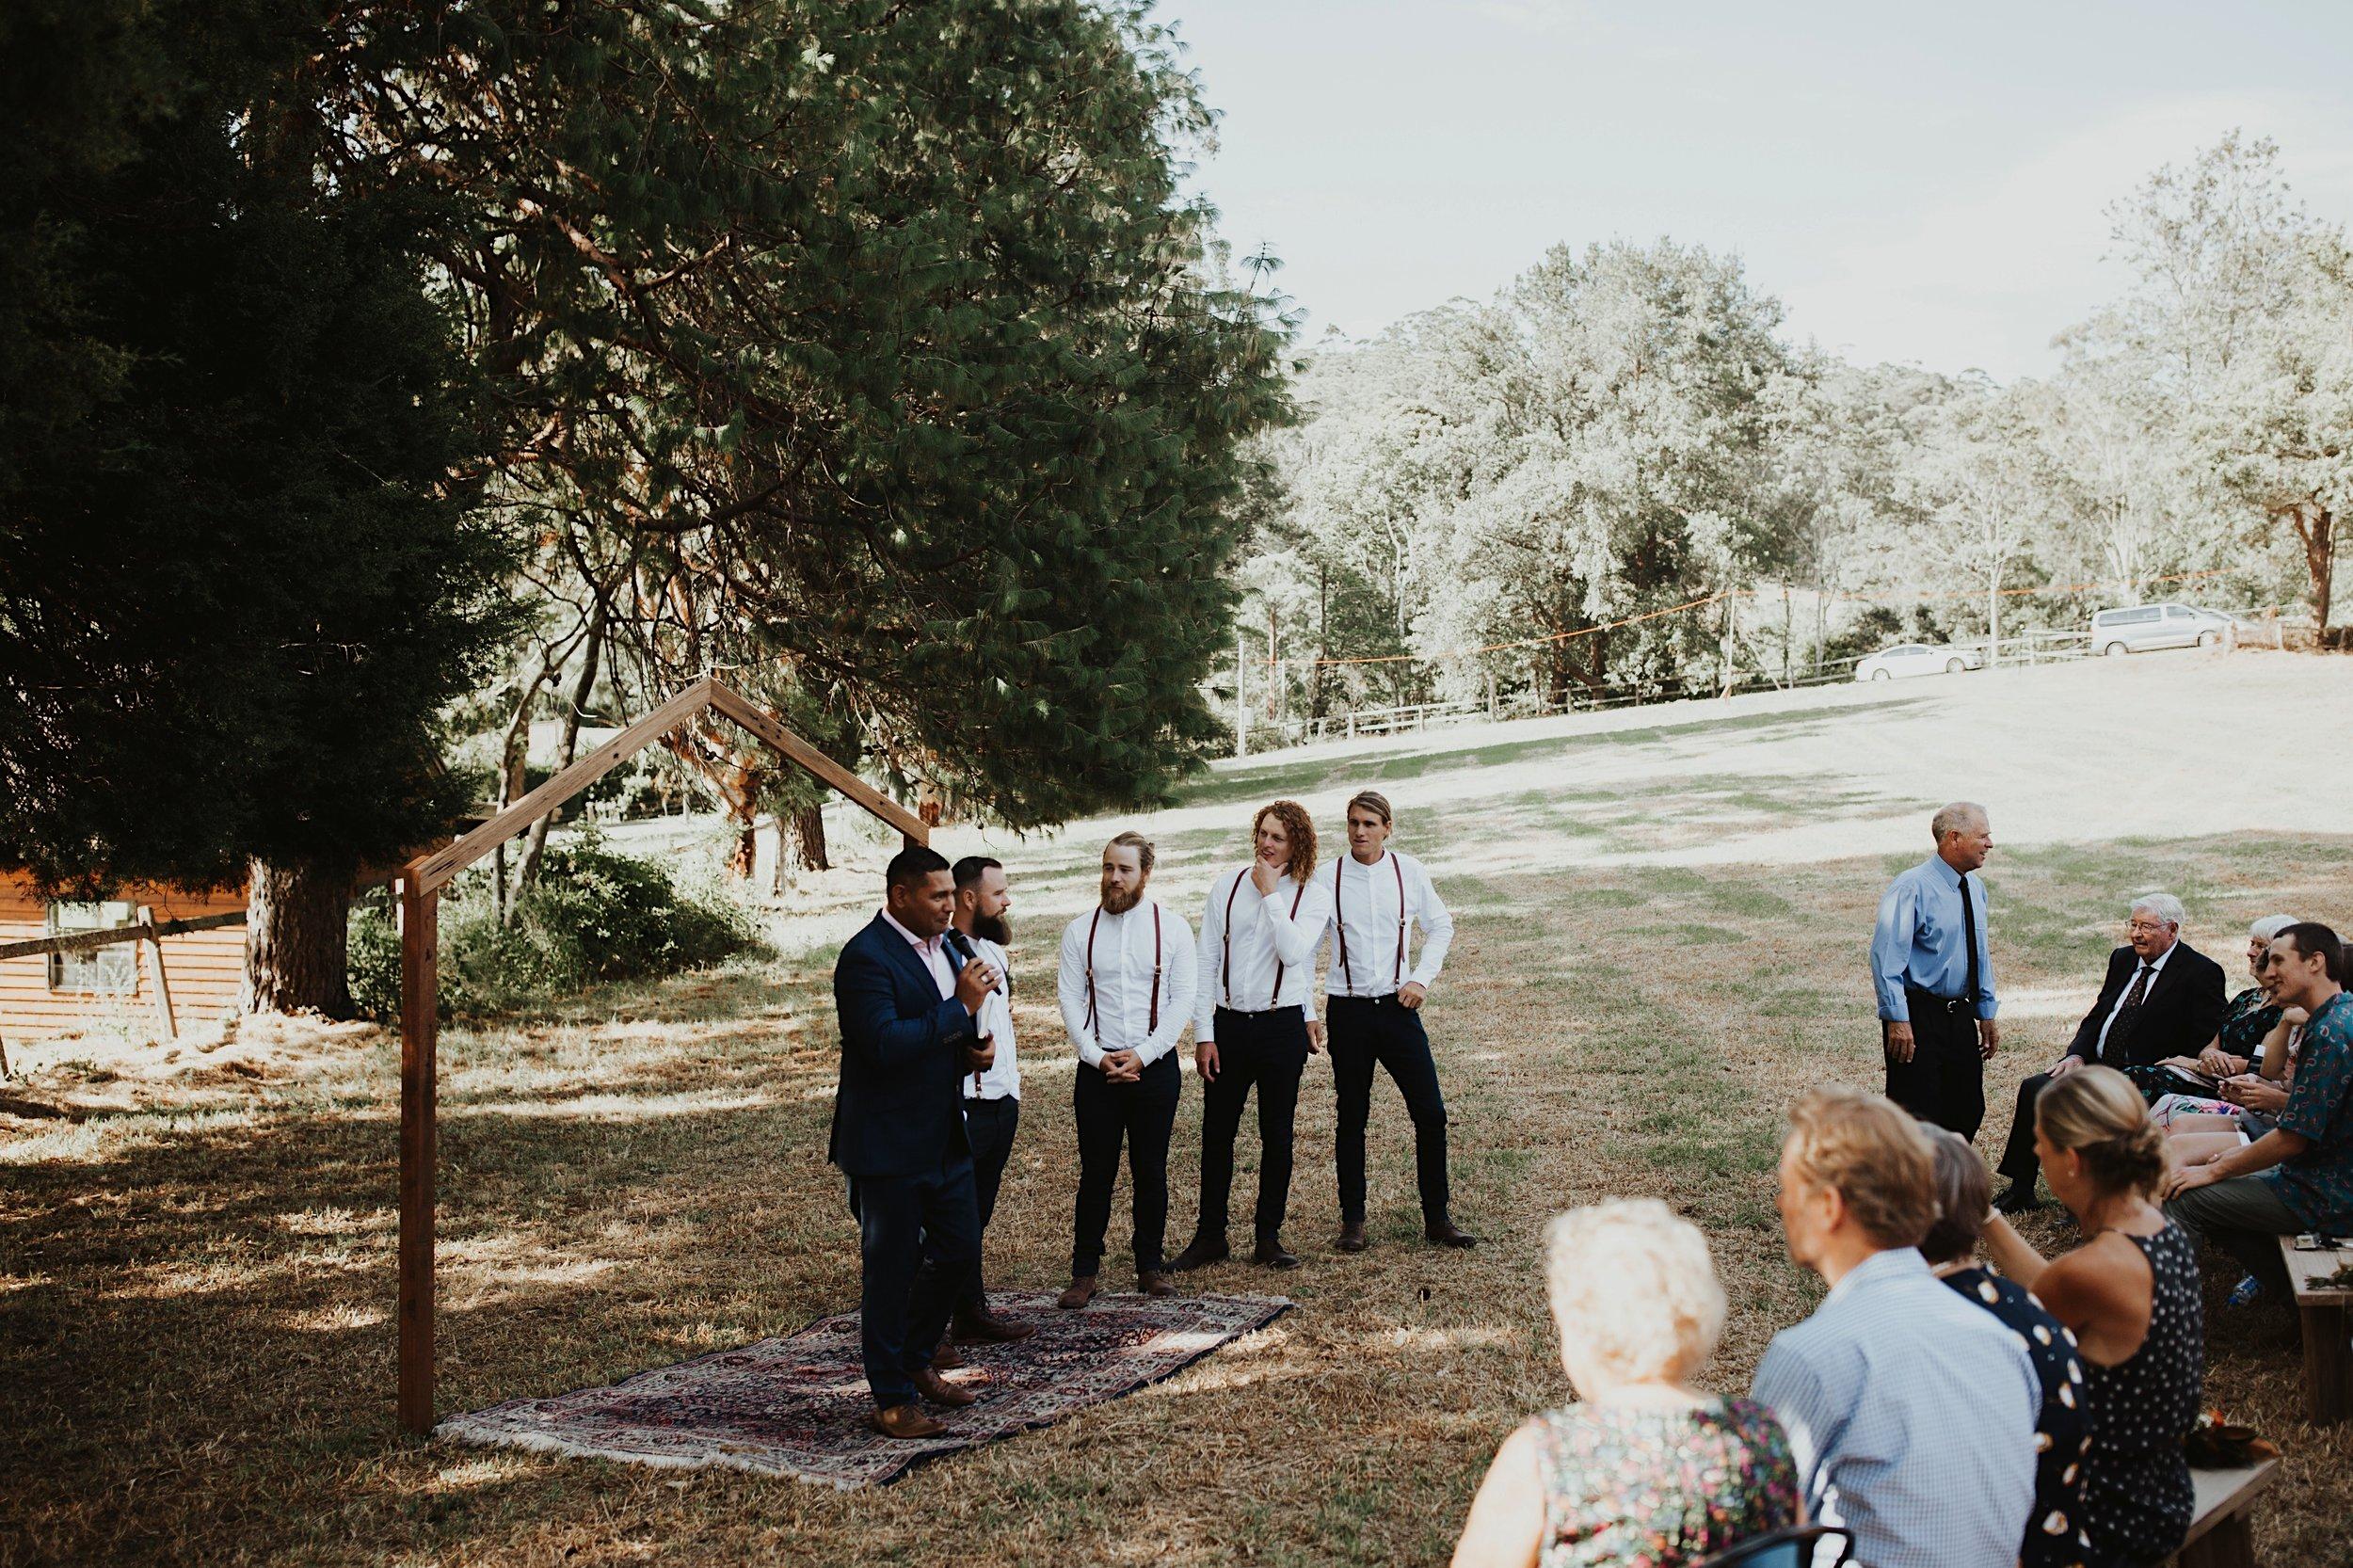 AustraliaweddingTom 0050.jpg